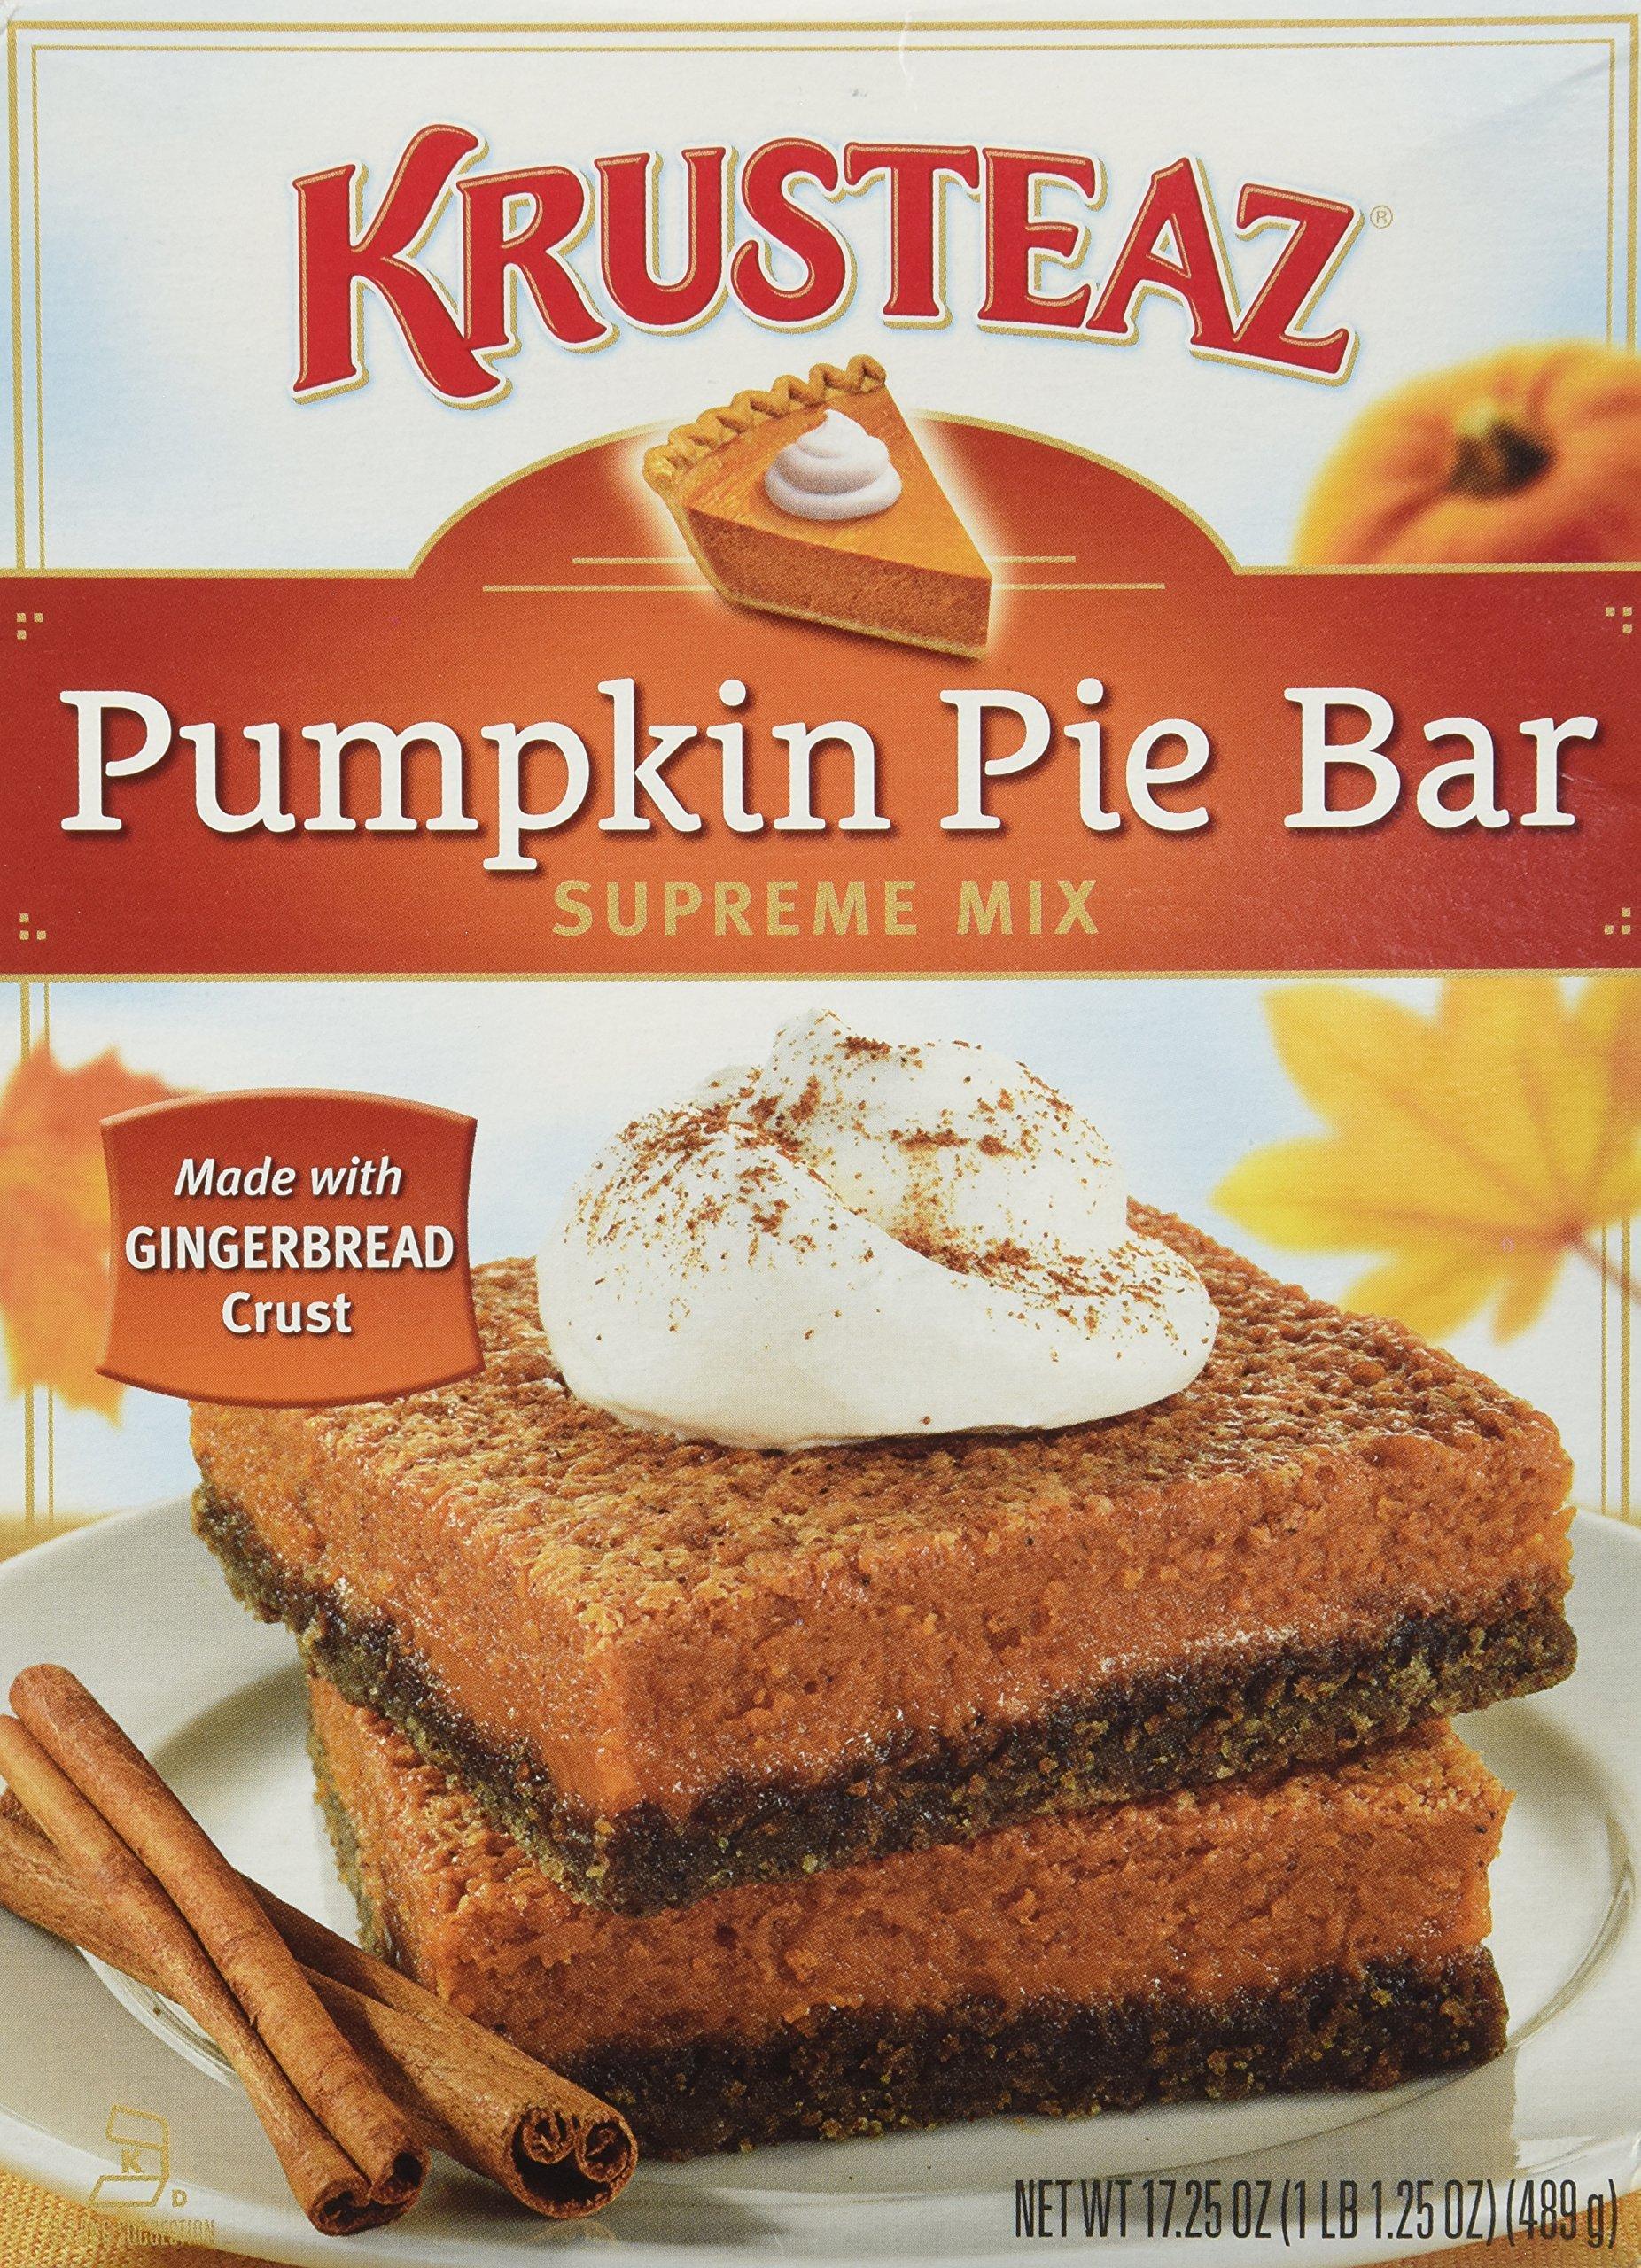 Krusteaz, Pumpkin Pie Bar Supreme Mix, 17.25oz Box (Pack of 3) by Krusteaz